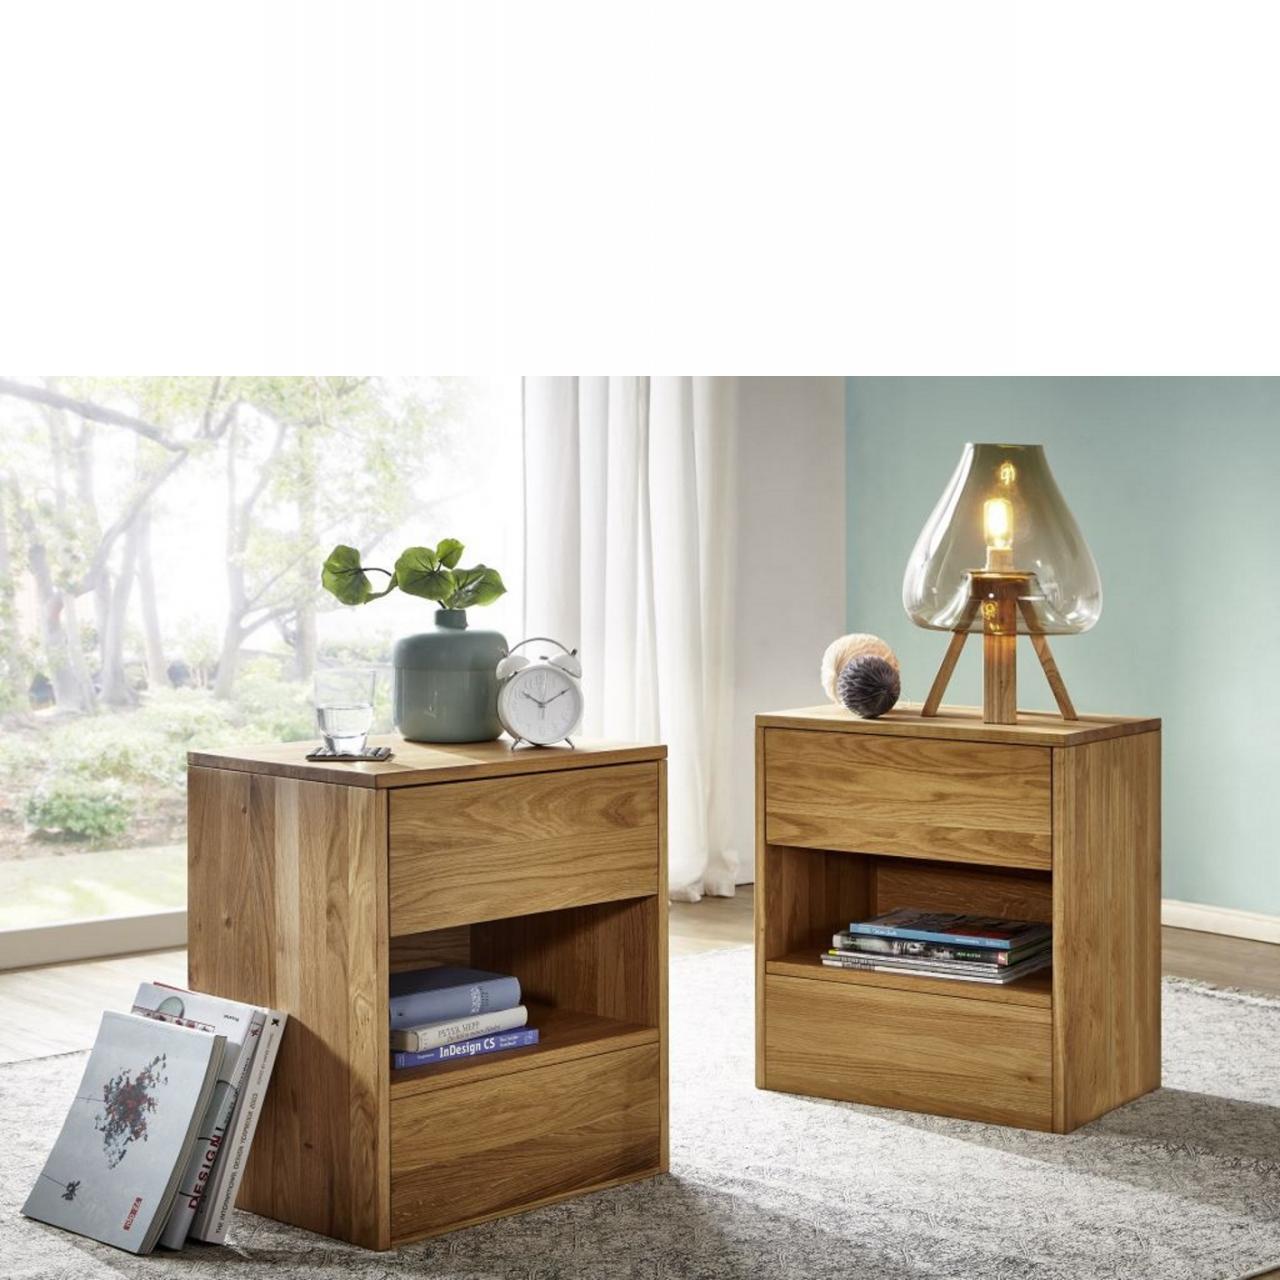 nachtkonsole oliver i beim bel schlafen m bel j hnichen center gmbh. Black Bedroom Furniture Sets. Home Design Ideas